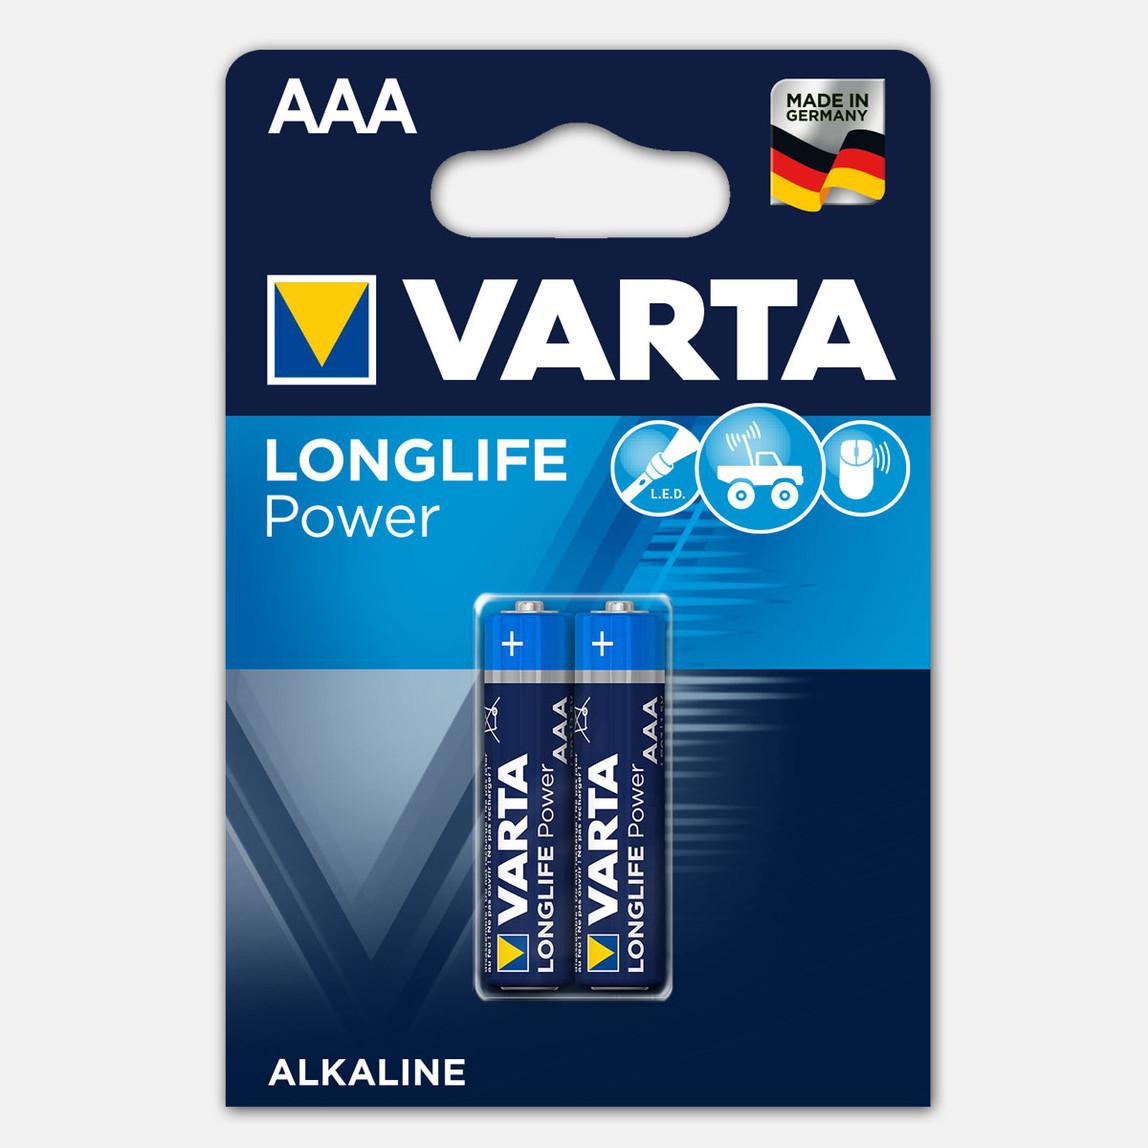 Varta Longlife Power 2 AAA Alkalin Pil